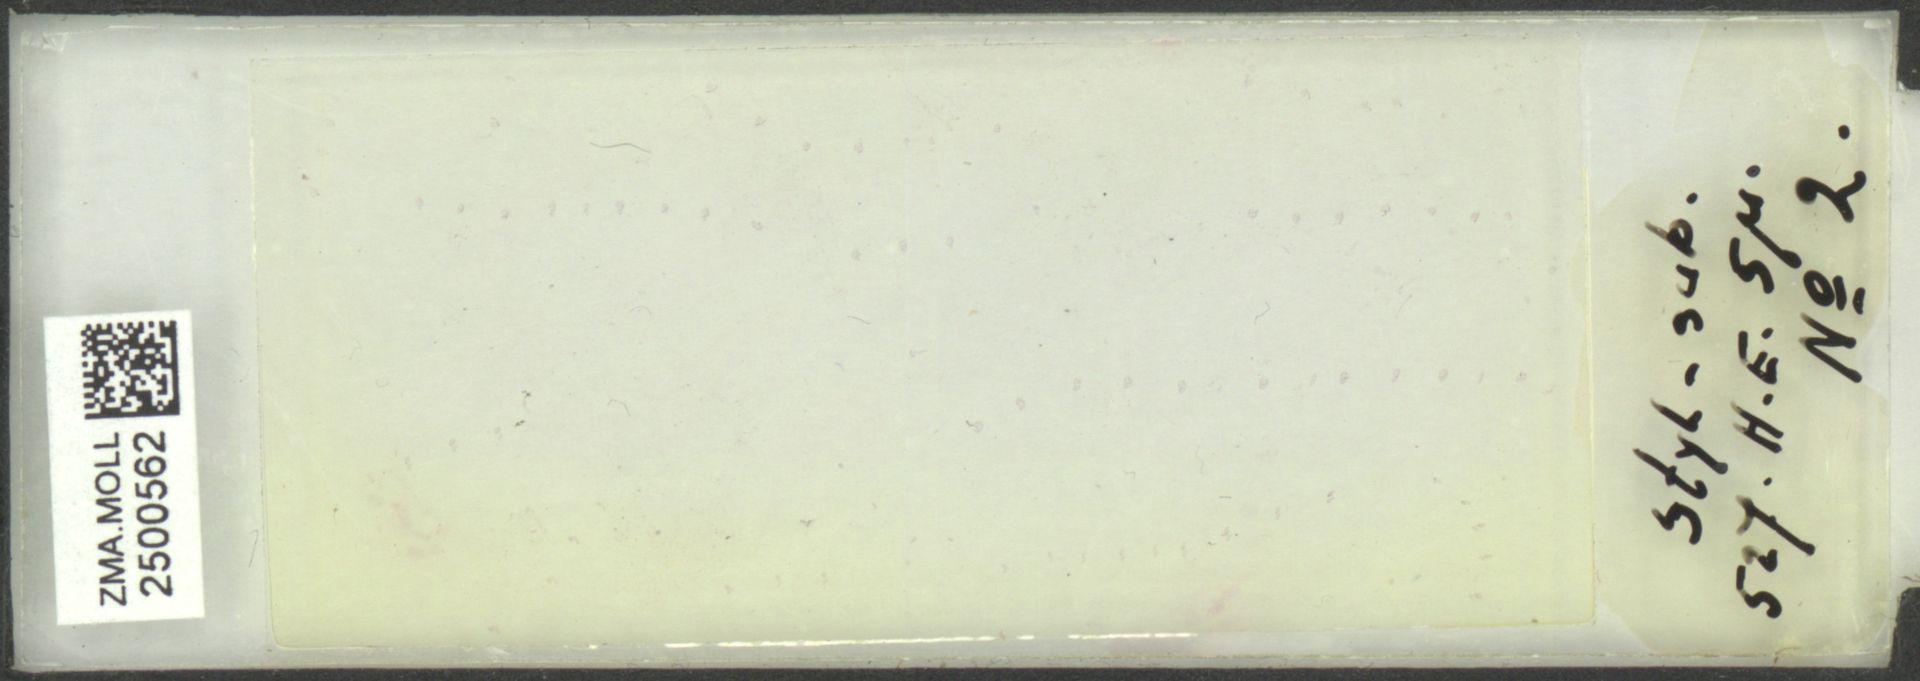 ZMA.MOLL.2500562 | Styliola subula (Quoy & Gaimard, 1827)